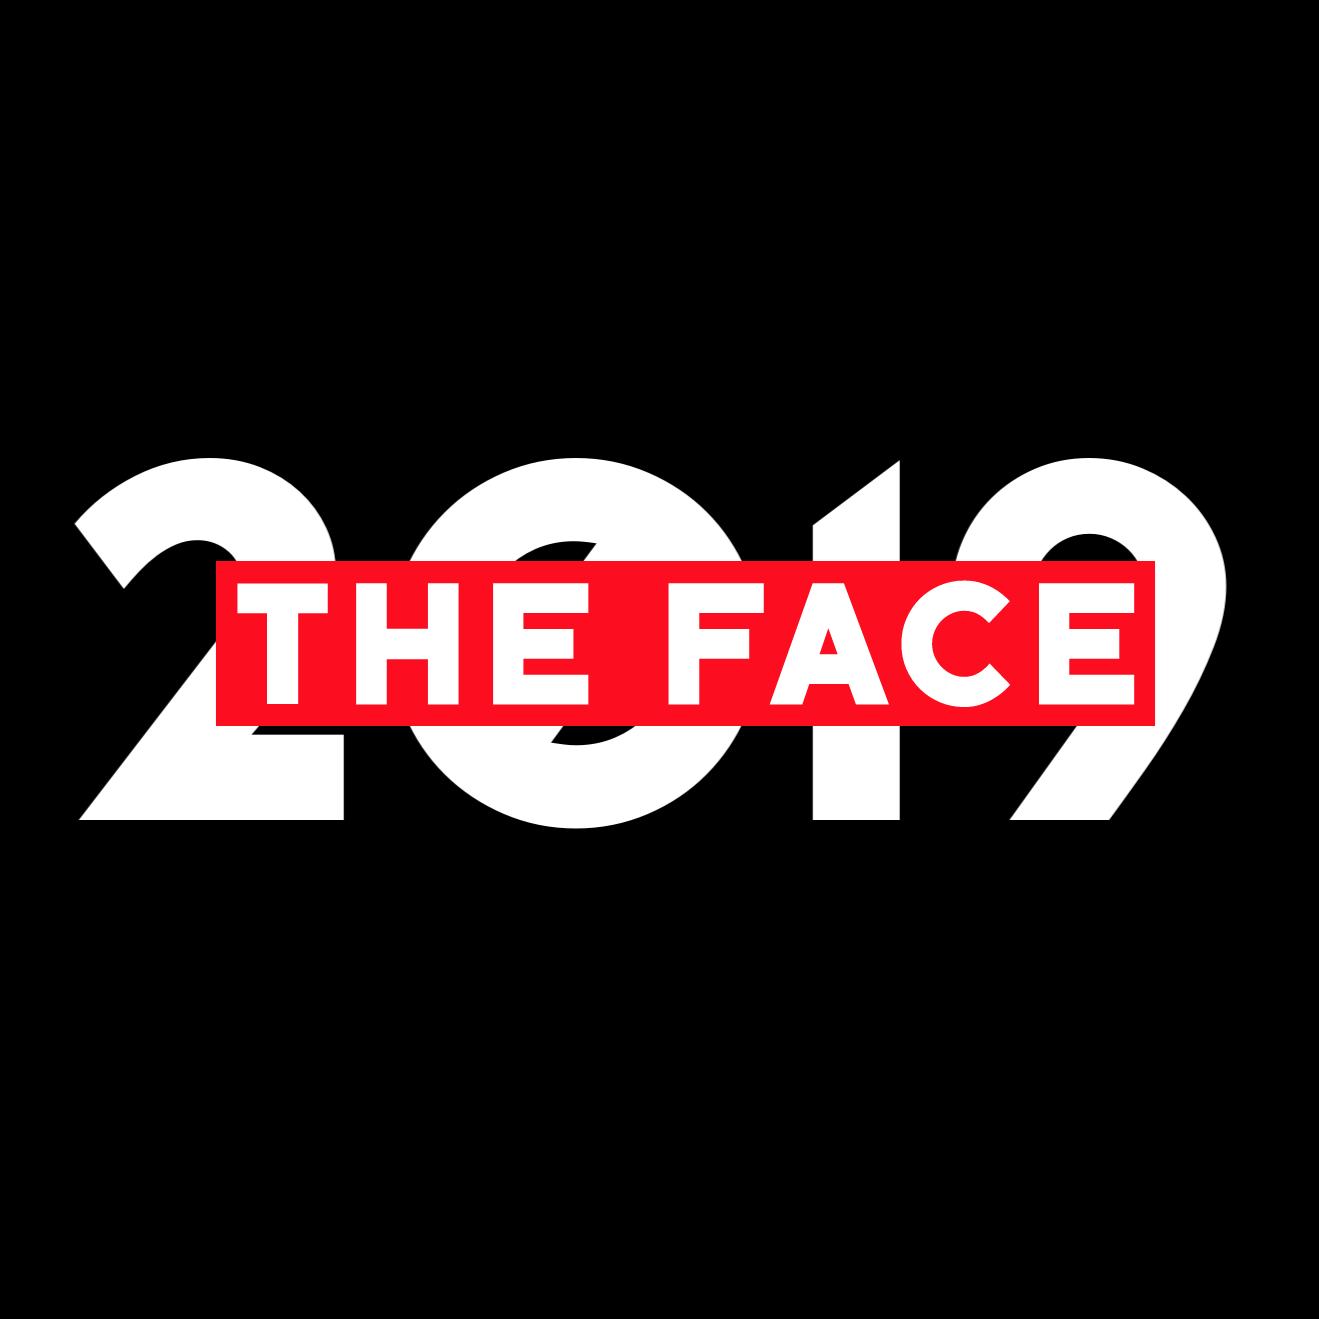 Paul Gorman on the return of The Face